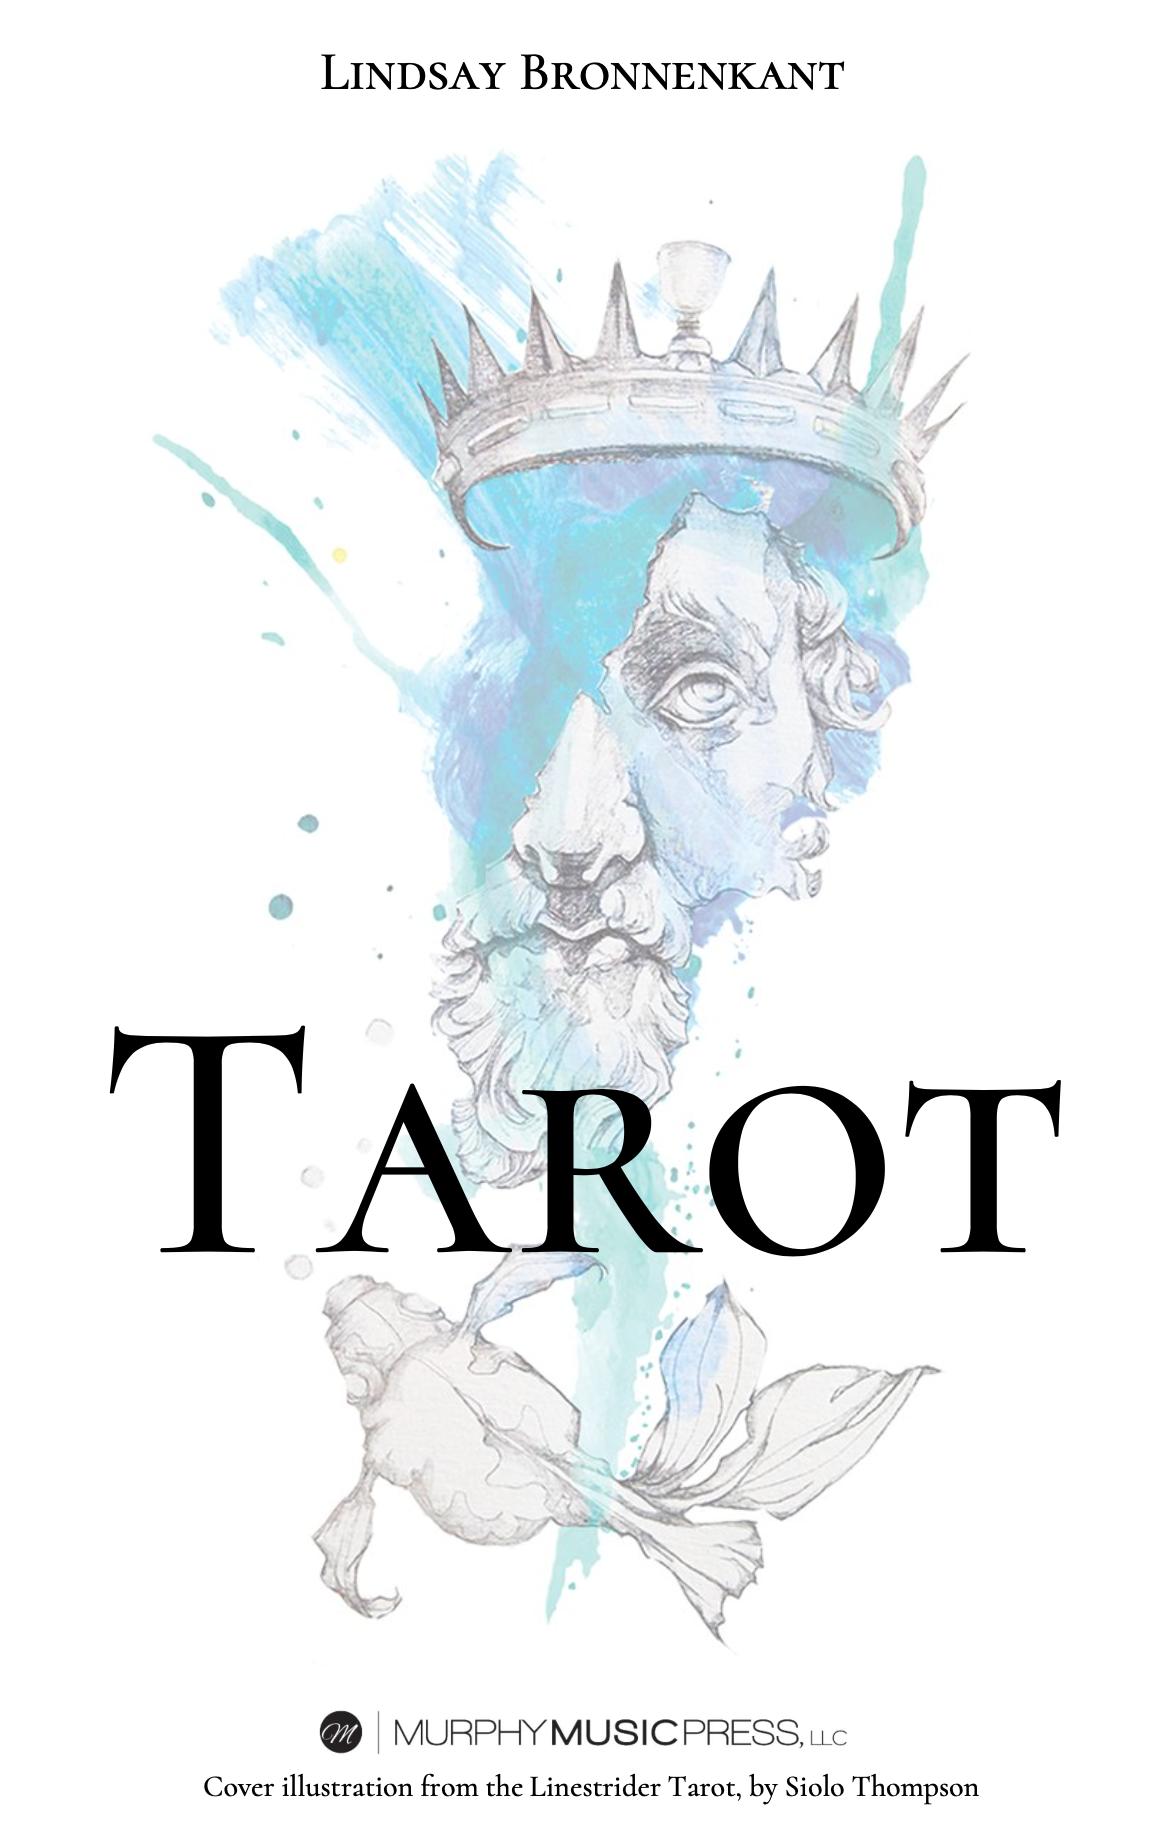 Tarot (Score Only) by Lindsay Bronnenkant